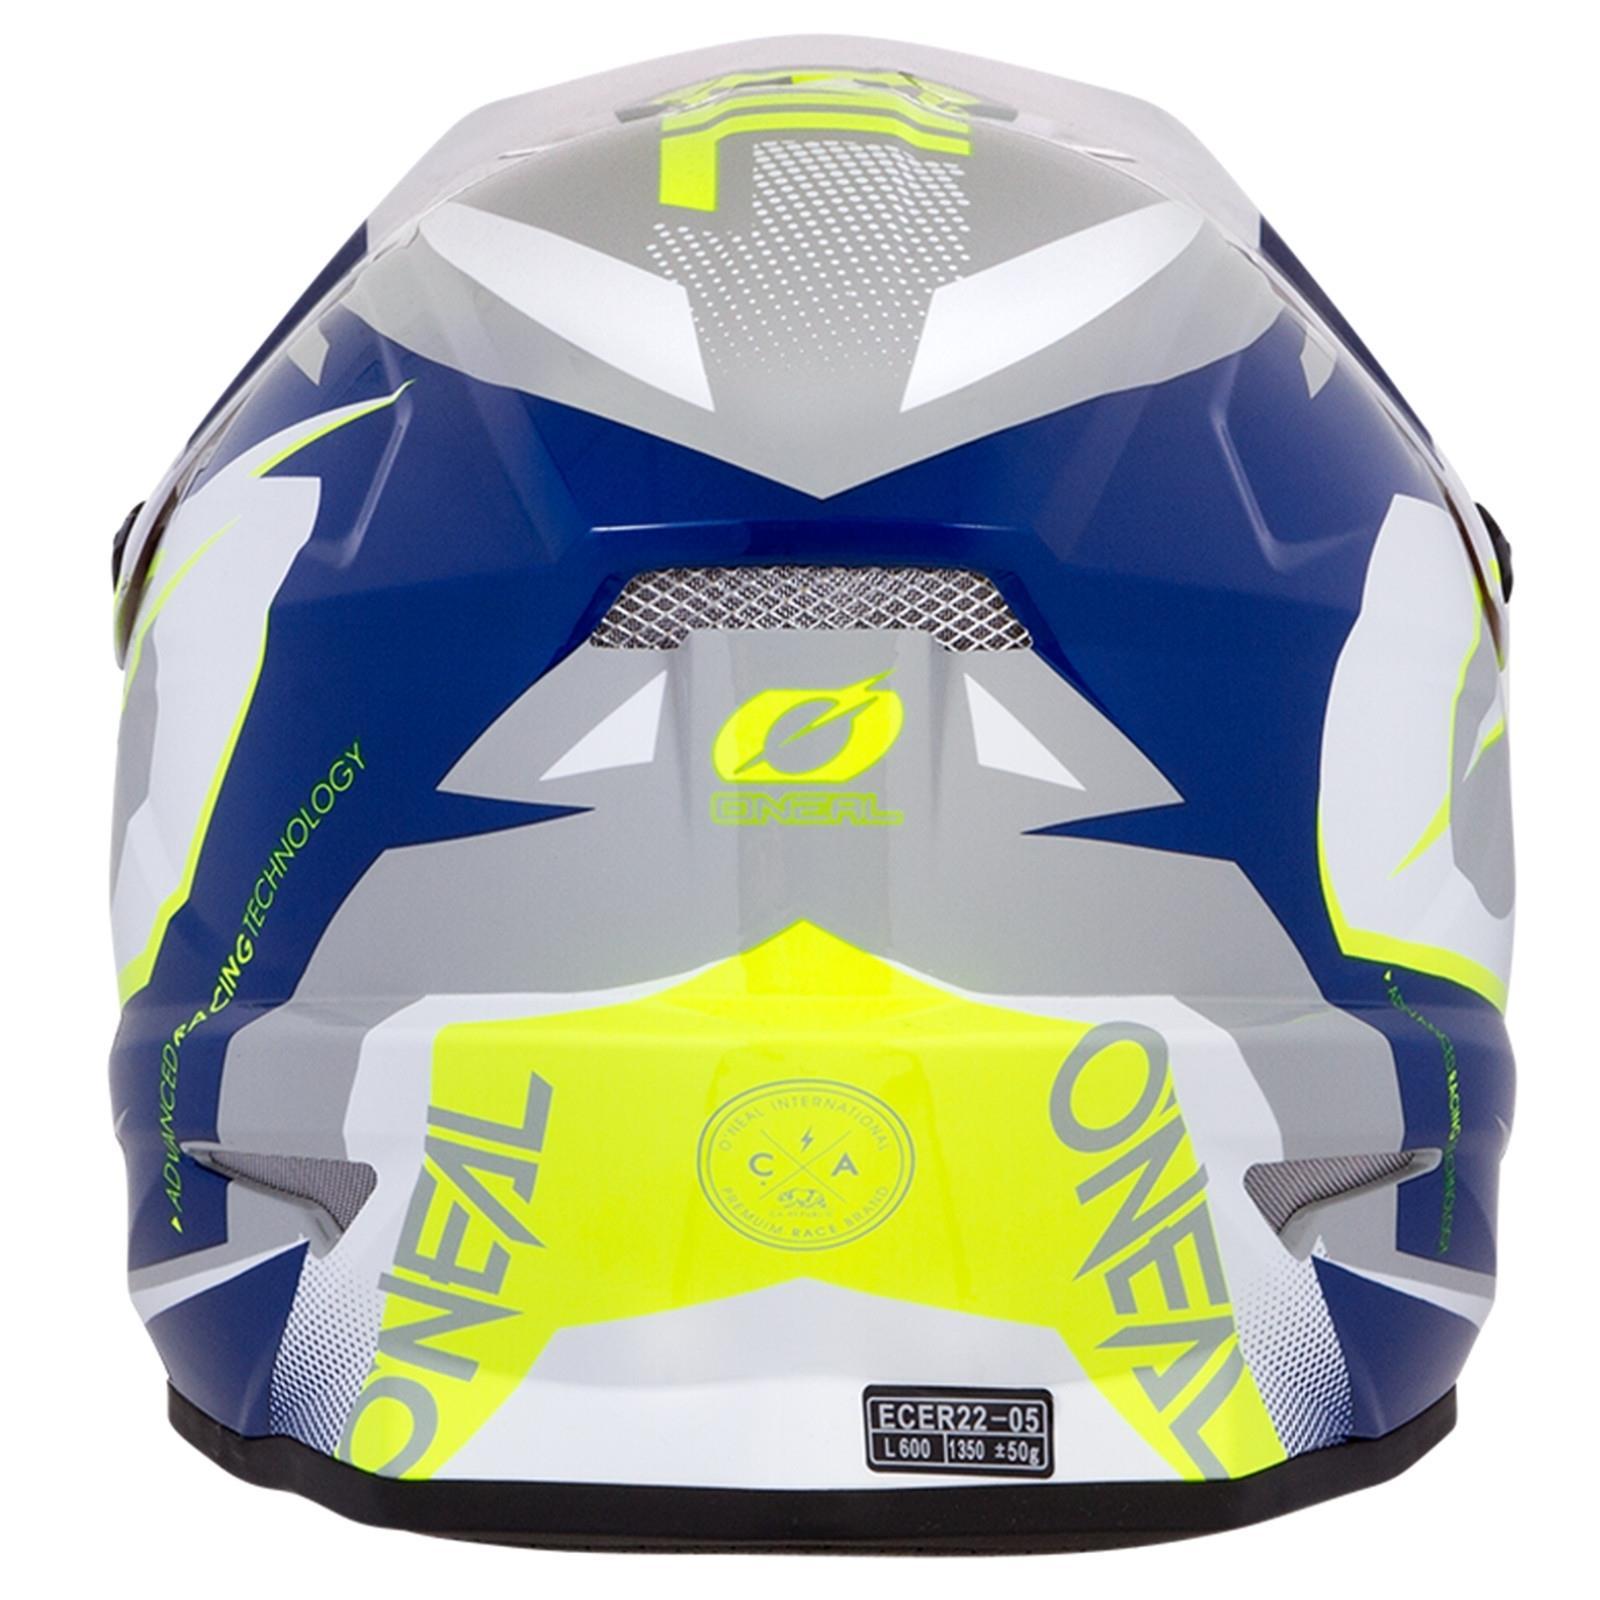 ONeal-Motocross-casco-MX-ENDURO-MOTO-BICI-FUORISTRADA-CROSS-Series-Adventure miniatura 39